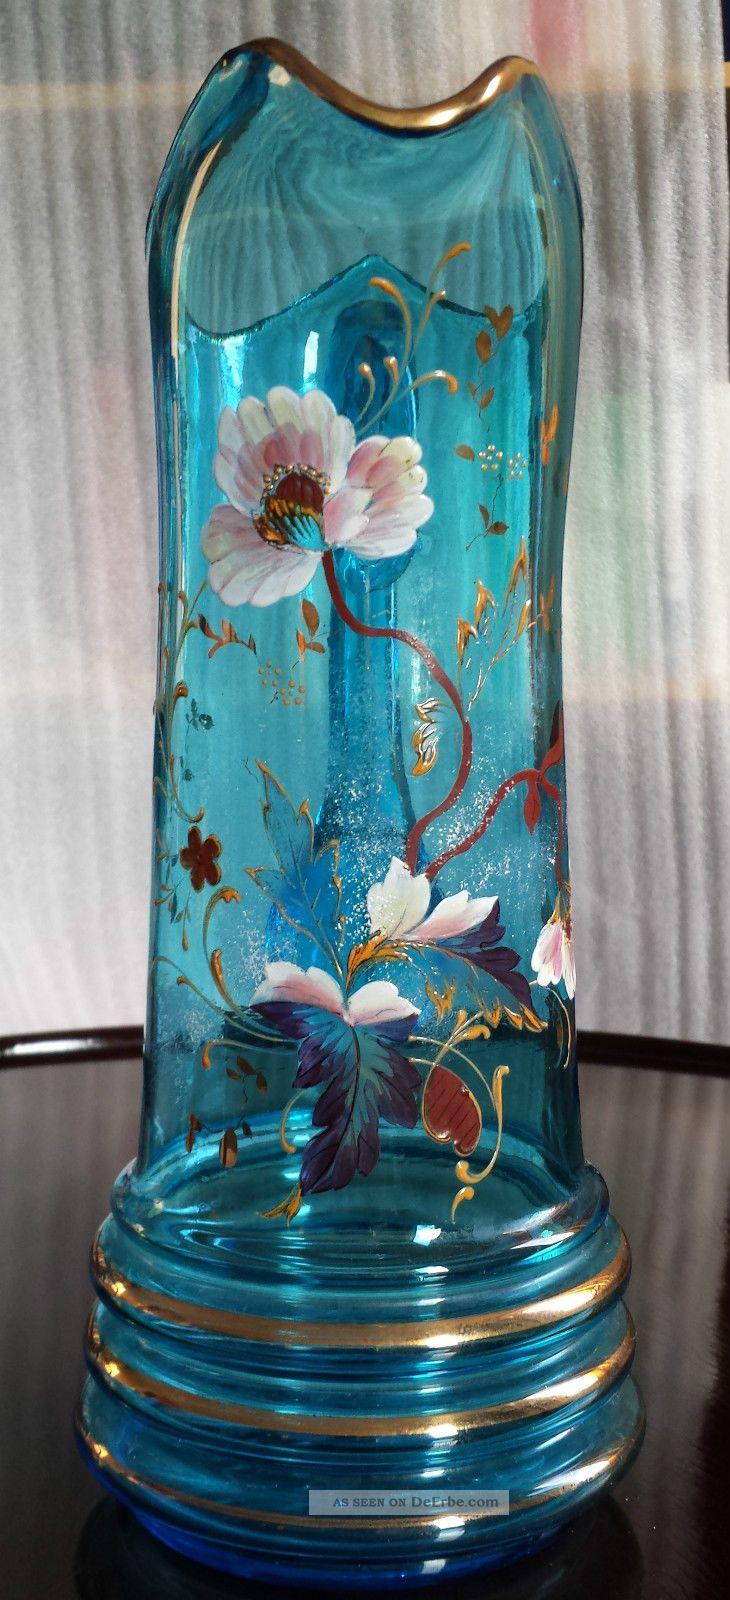 Saftkaraffe Emailmalerei Jus Carafe Peinture émail Juice Carafe Enamel Painting Glas & Kristall Bild